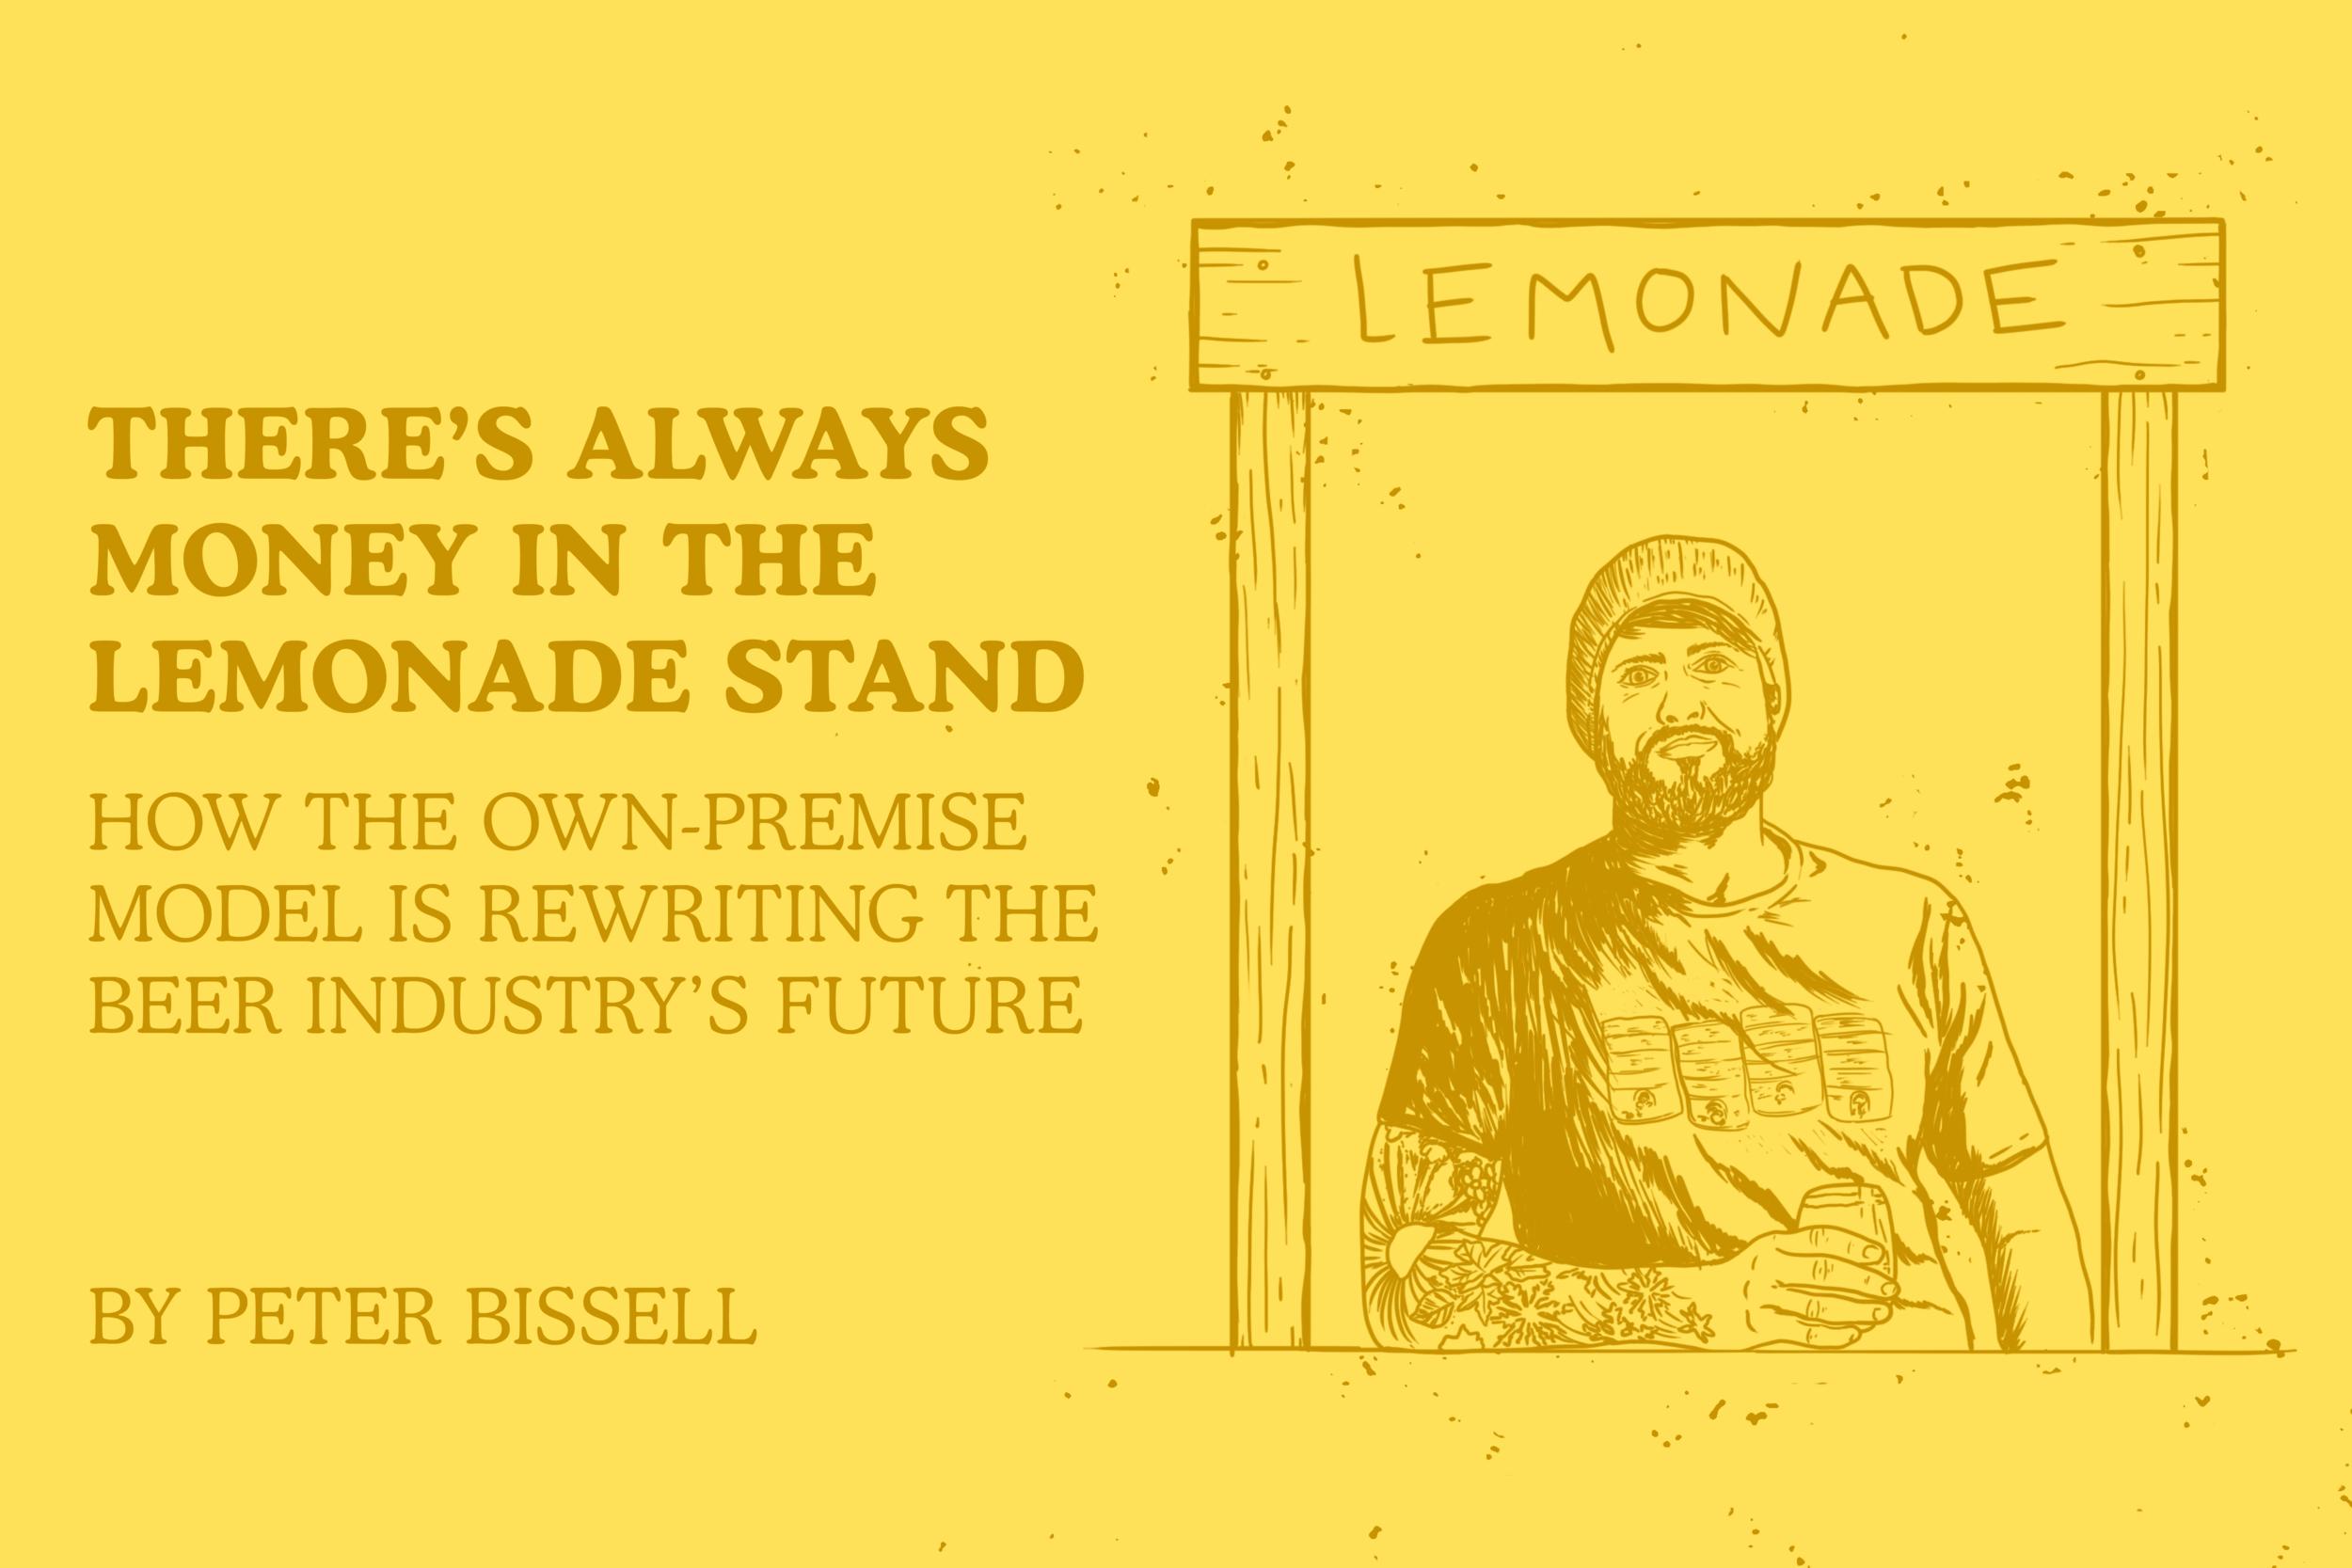 LemonadeStand_Cover.png